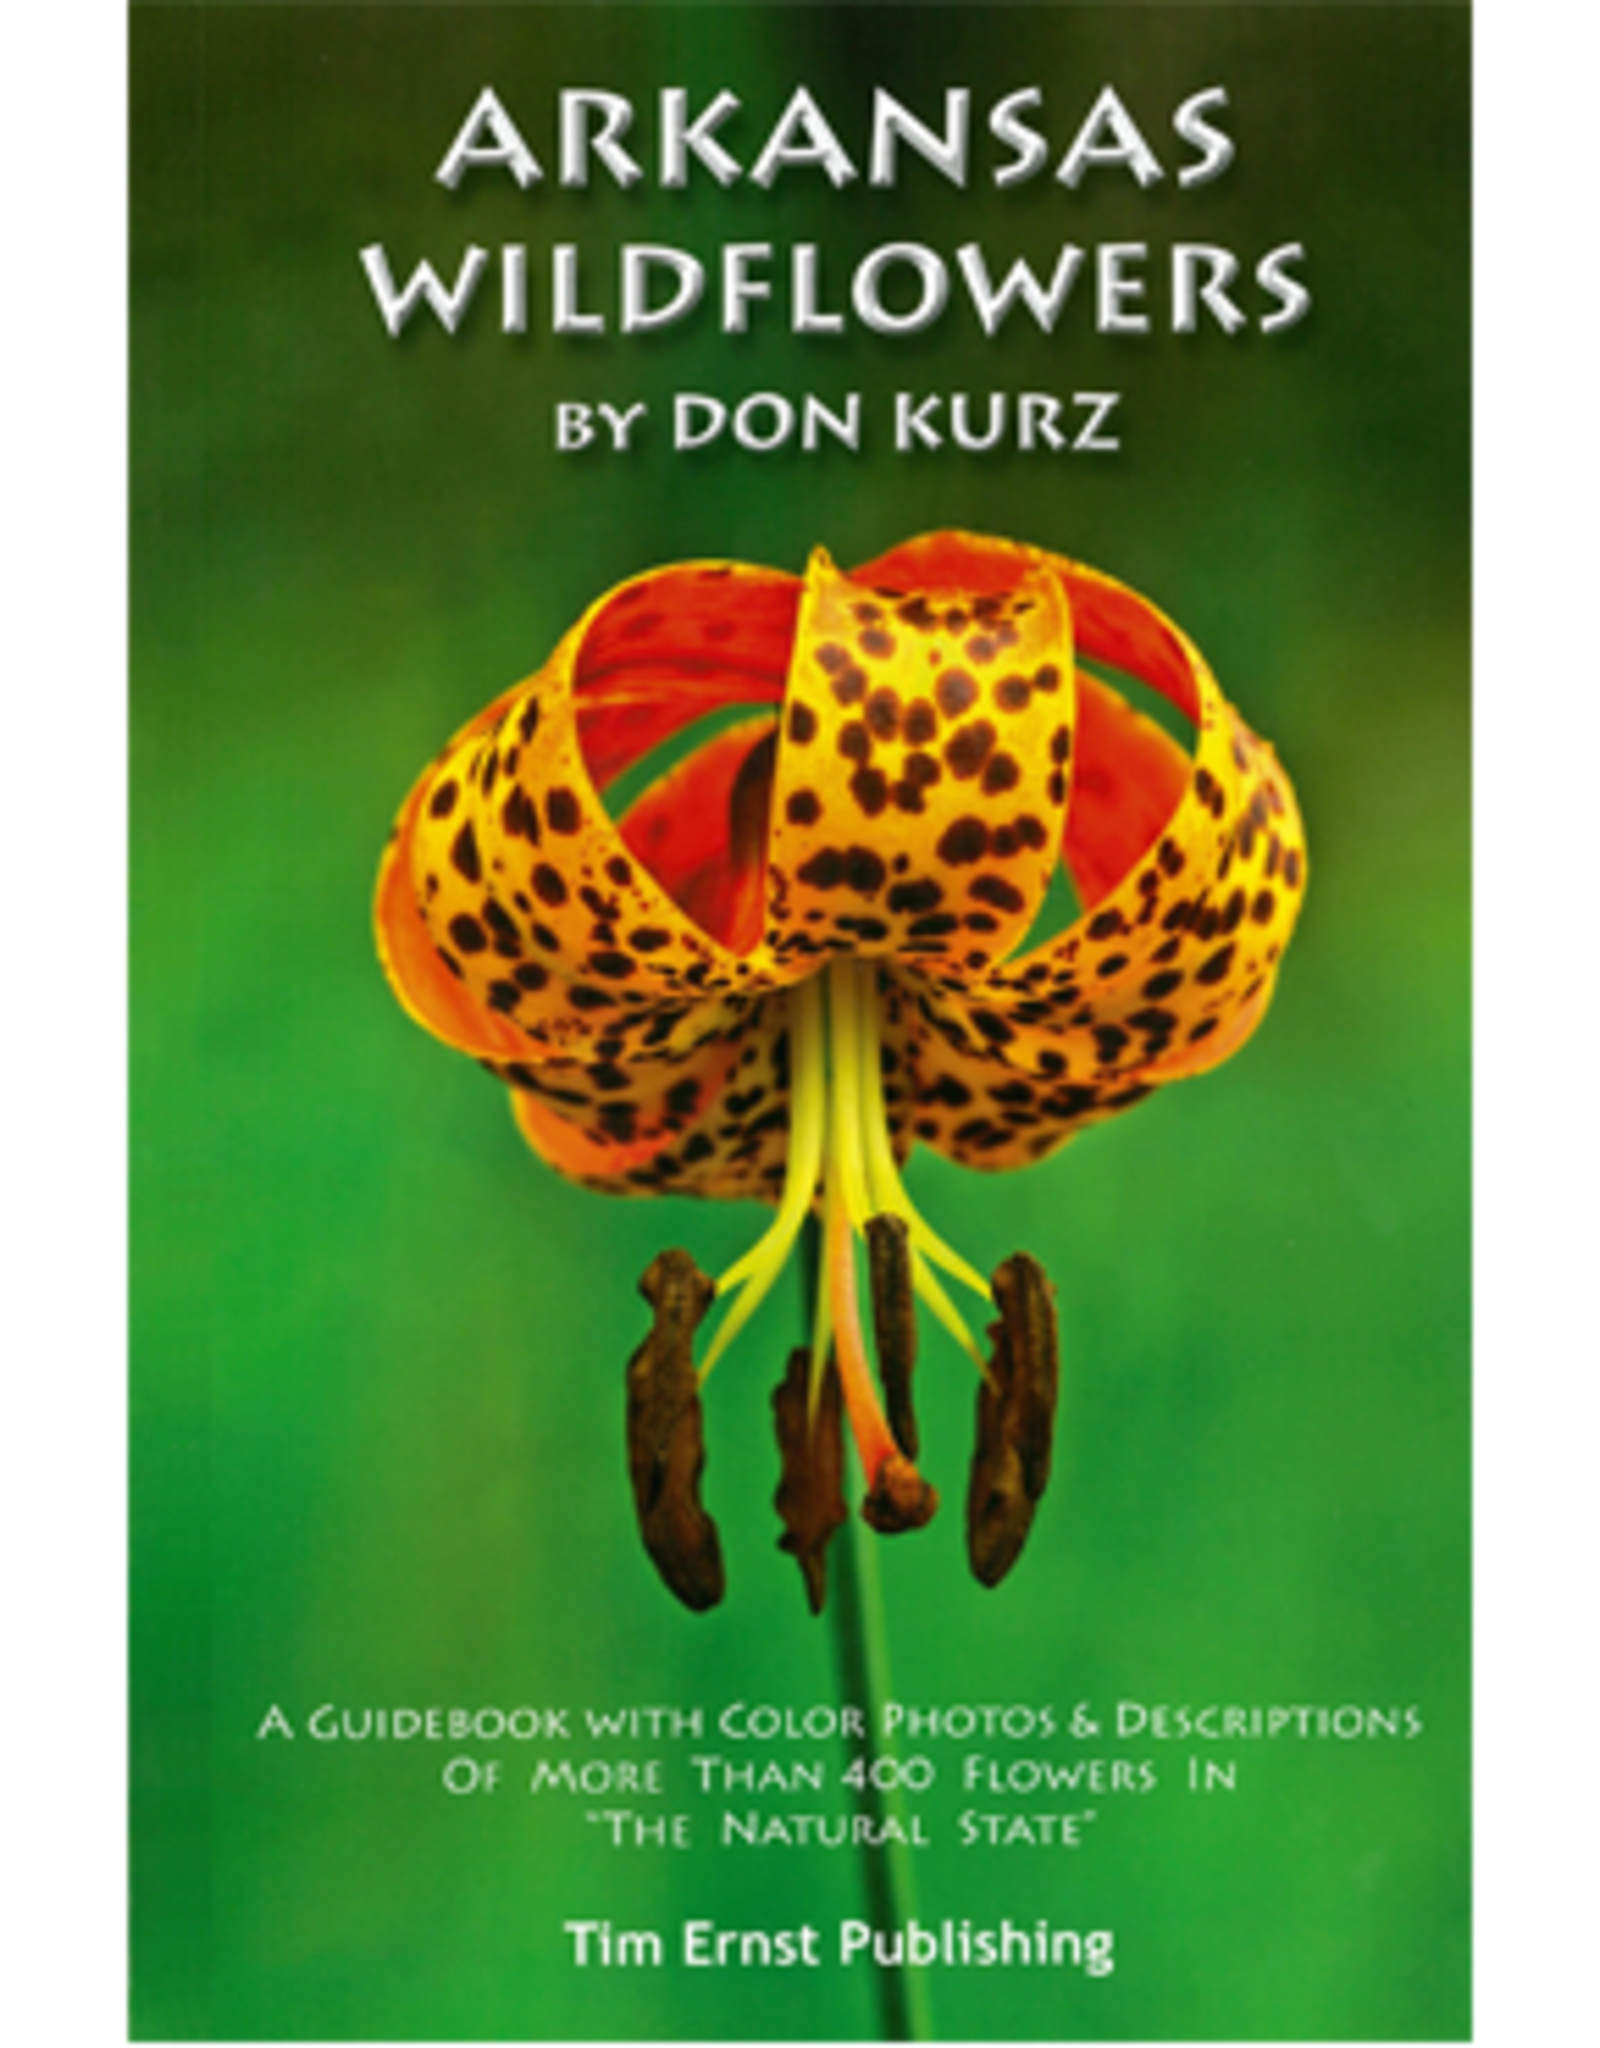 Arkansas Wildflowers by Don Kurz